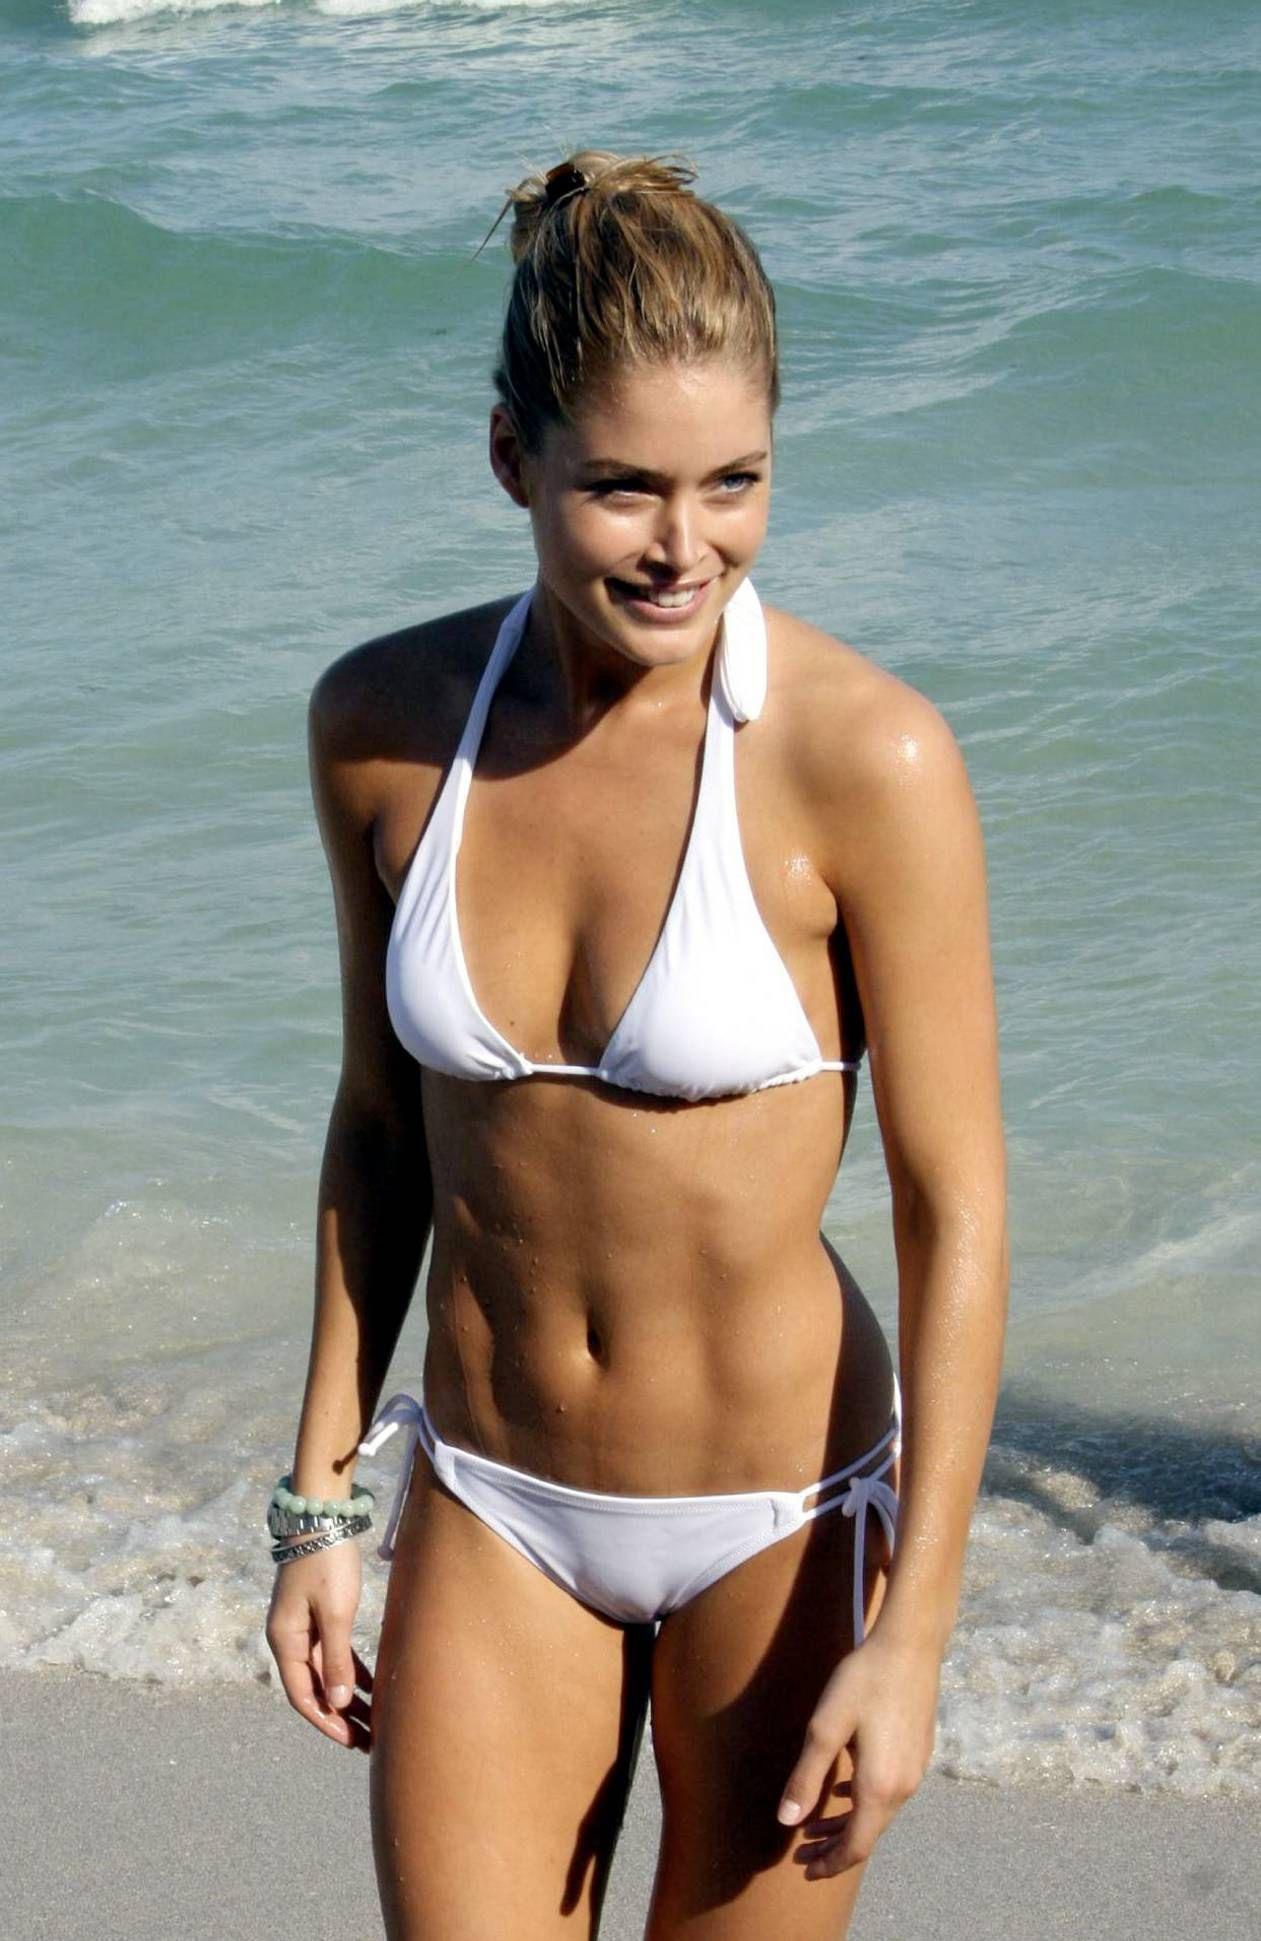 1000+ images about Beach Heat on Pinterest | Bikinis, Surf girls ...